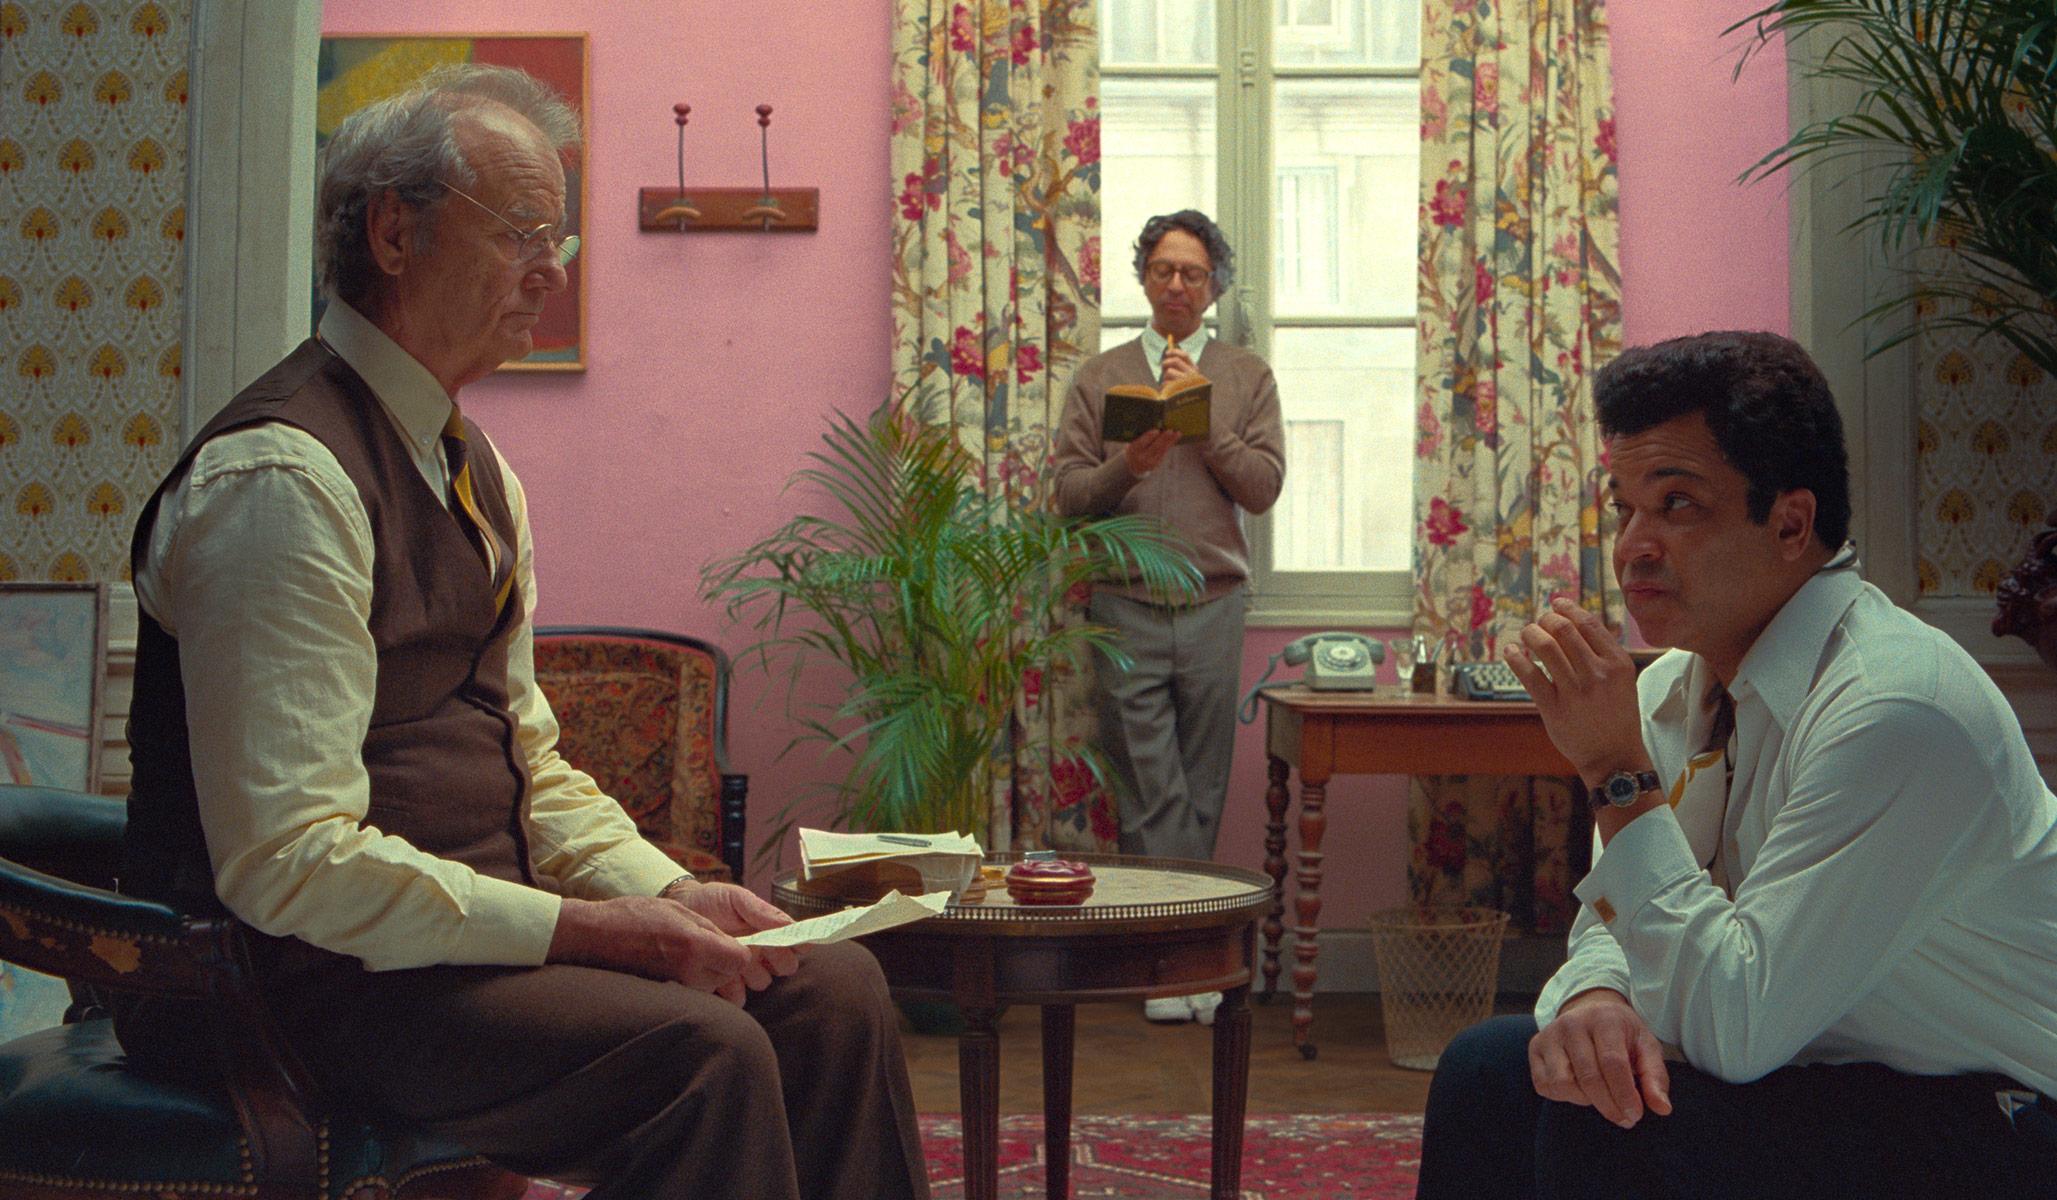 Review Film 'The French Dispatch': Film Wes Anderson Memiliki Permukaan Cantik, Tanpa Hati